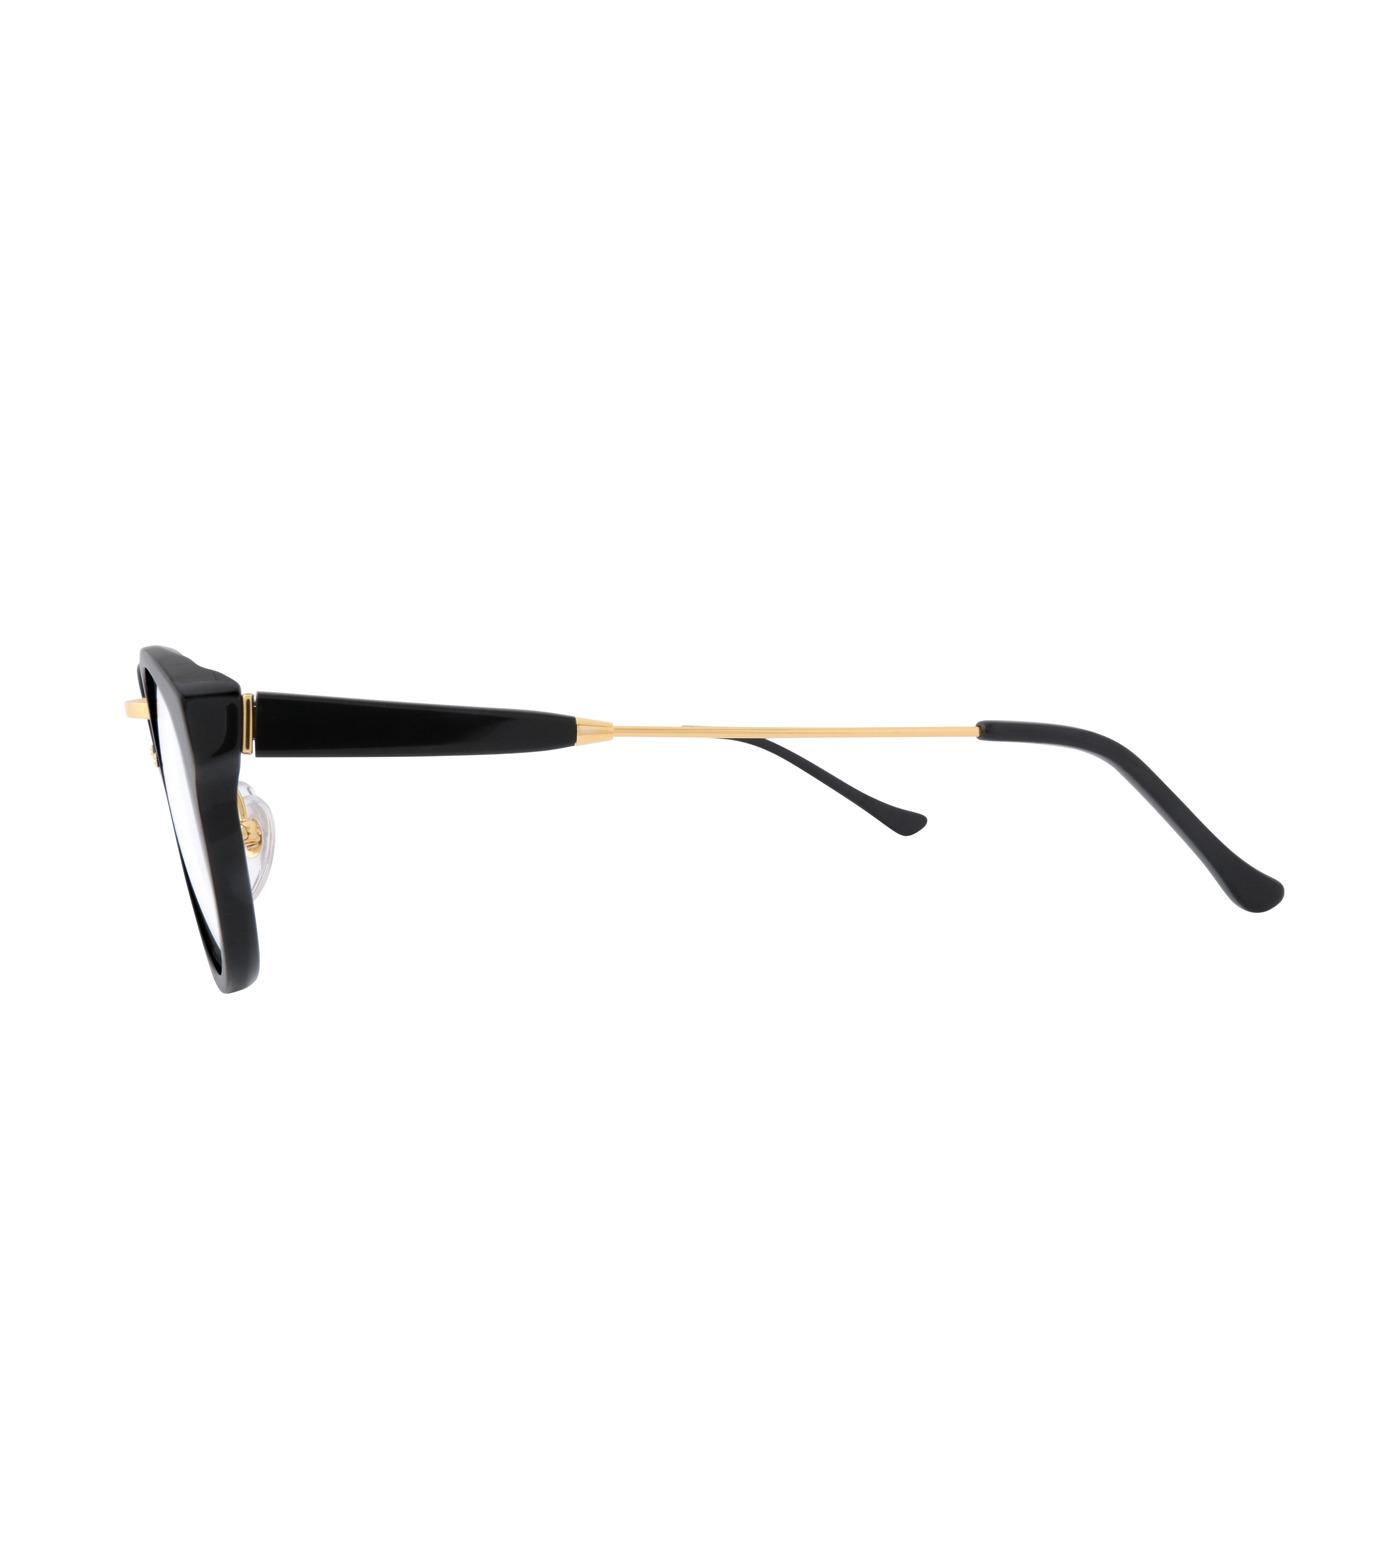 SUPER(スーパー)のPANAMA BLACK CLEAR LENS-BLACK(アイウェア/eyewear)-SPRXXXX054-13 拡大詳細画像2